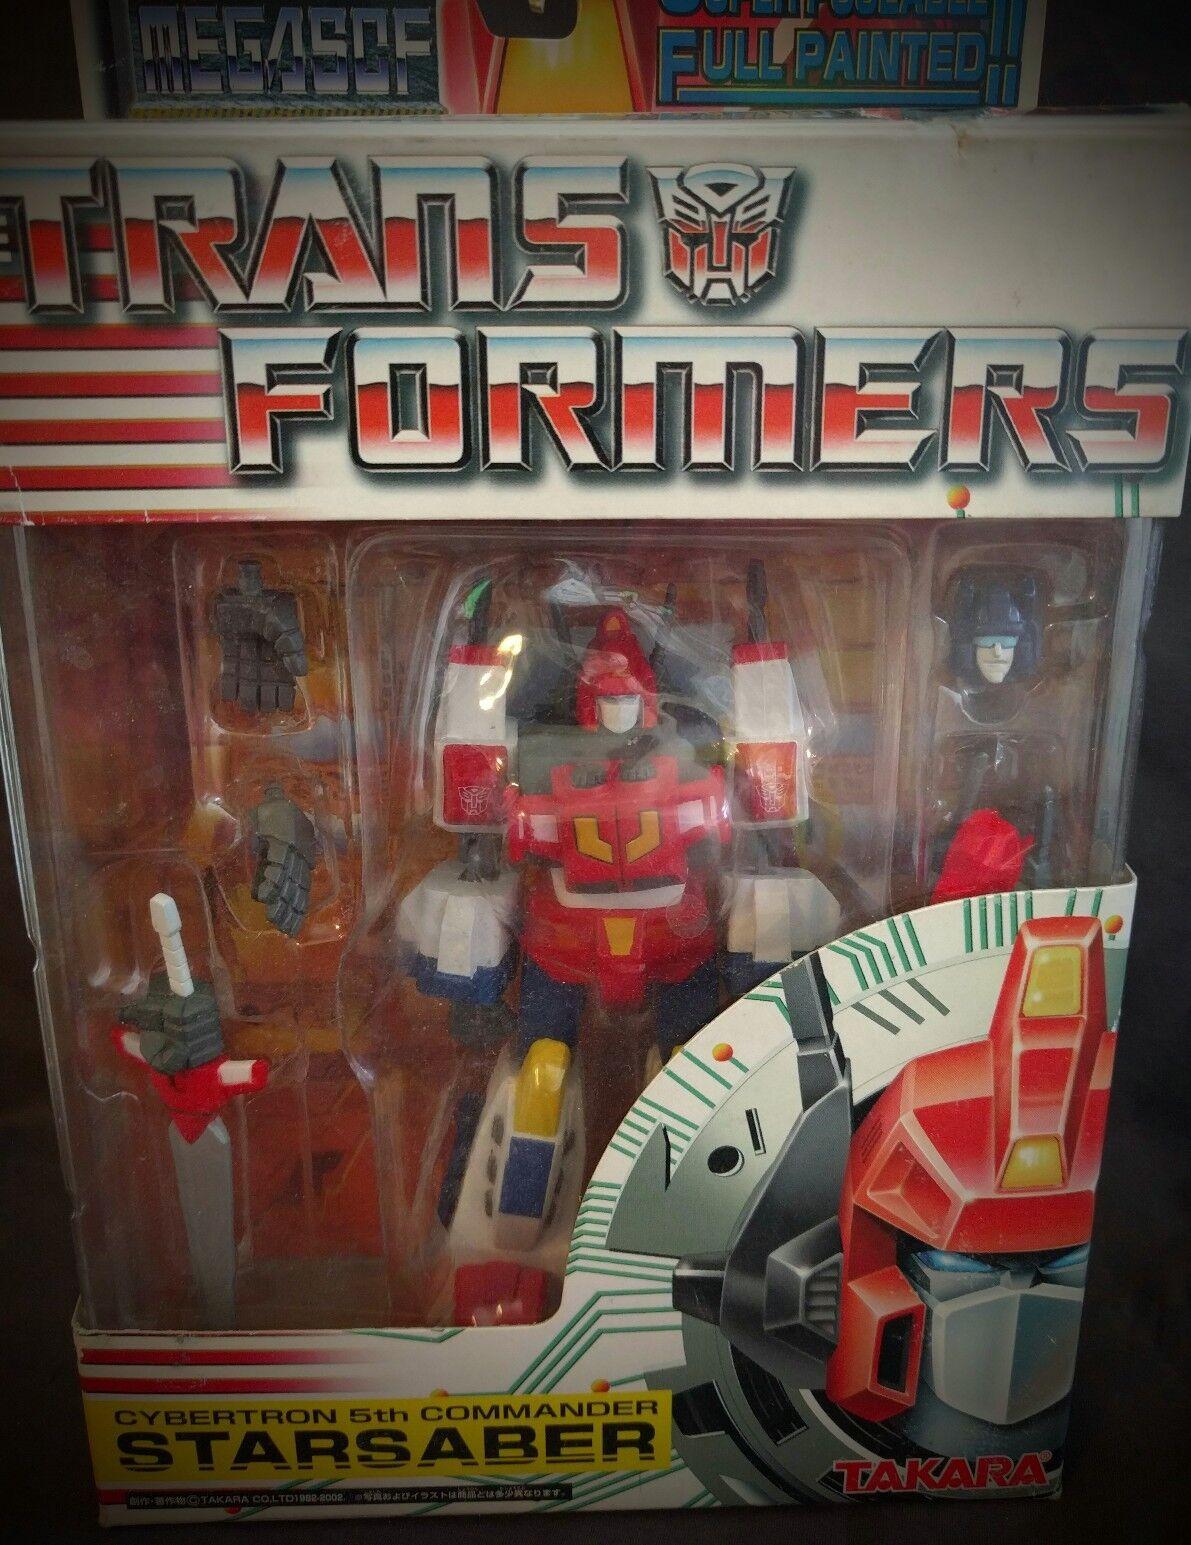 MEGASCF Transformers Cybertron 5th Commander STAR SABER Takara MISB, RARE